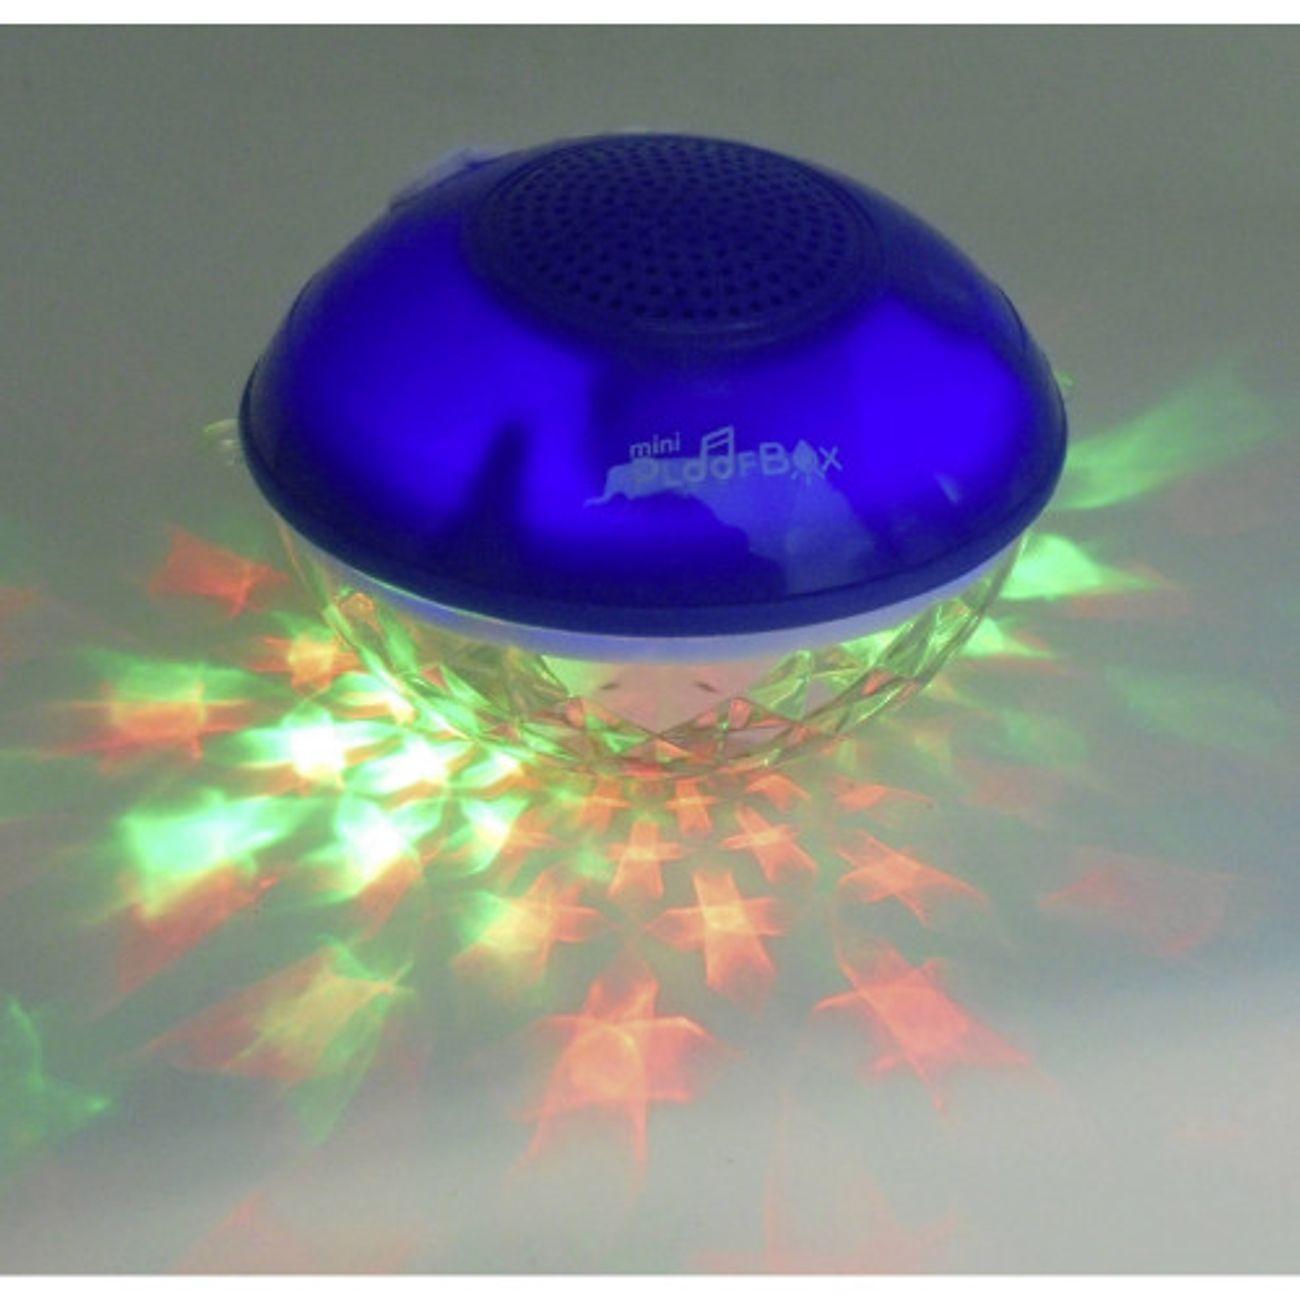 MAGNETICLAND Enceinte lumineuse étanche bleue 5W Mini-PLOOFBOX